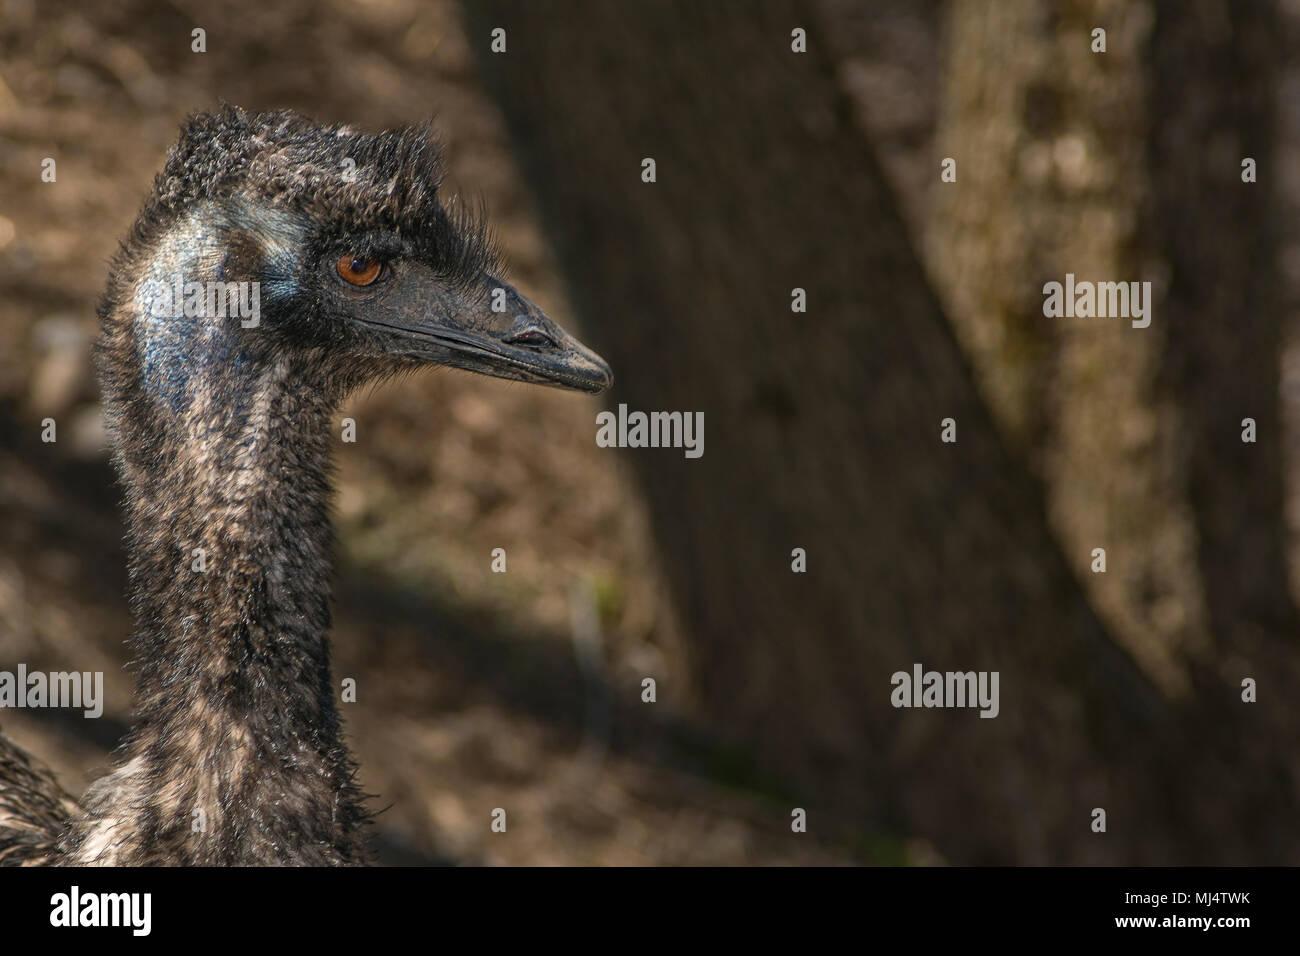 Head shot of an emu - Stock Image